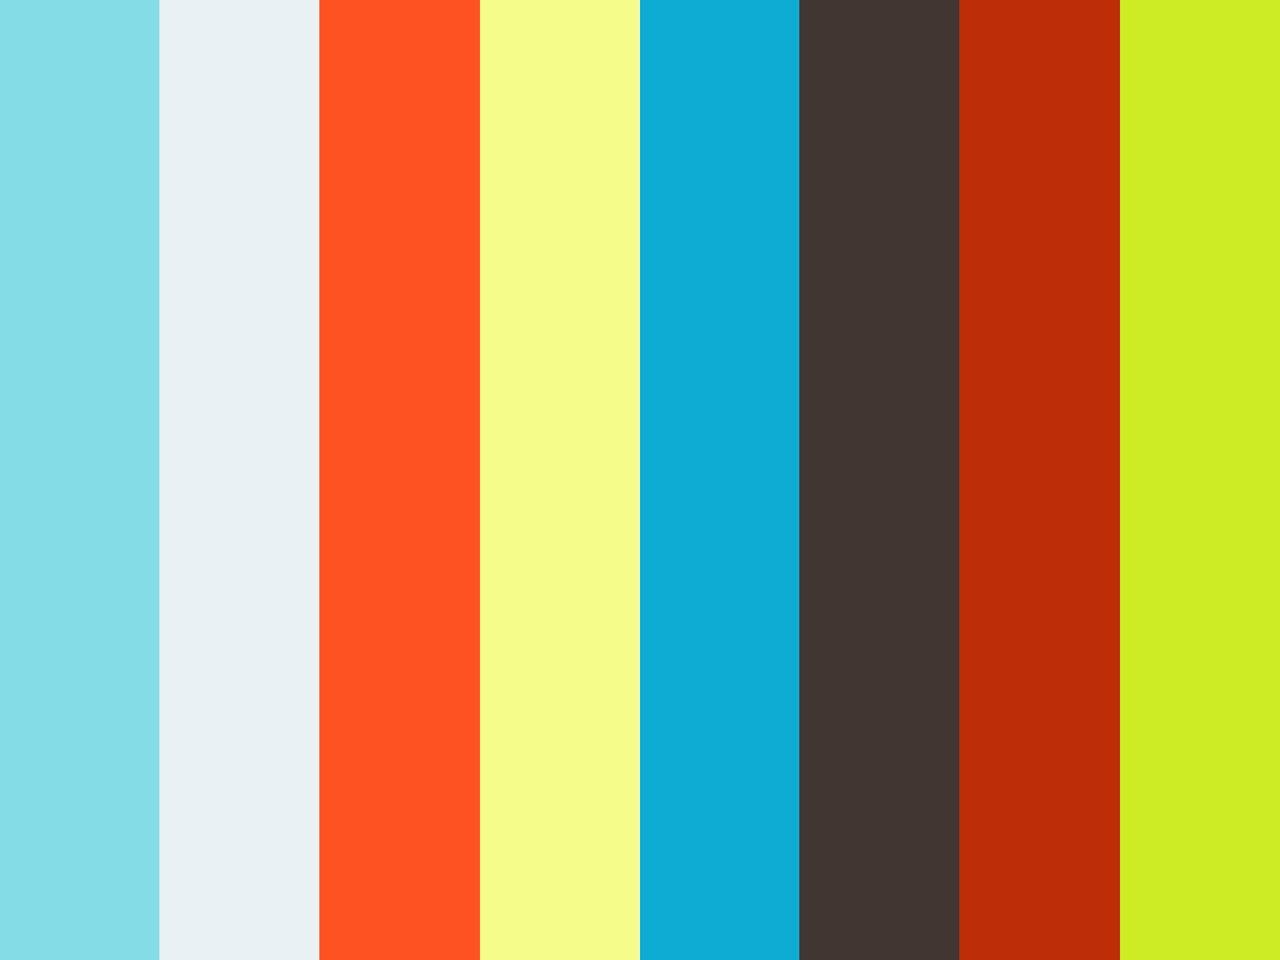 Kosmokato* //teaser// Lumix GH5 2.8 lowlight test // O.I.S + IBIS // Blade Runner style